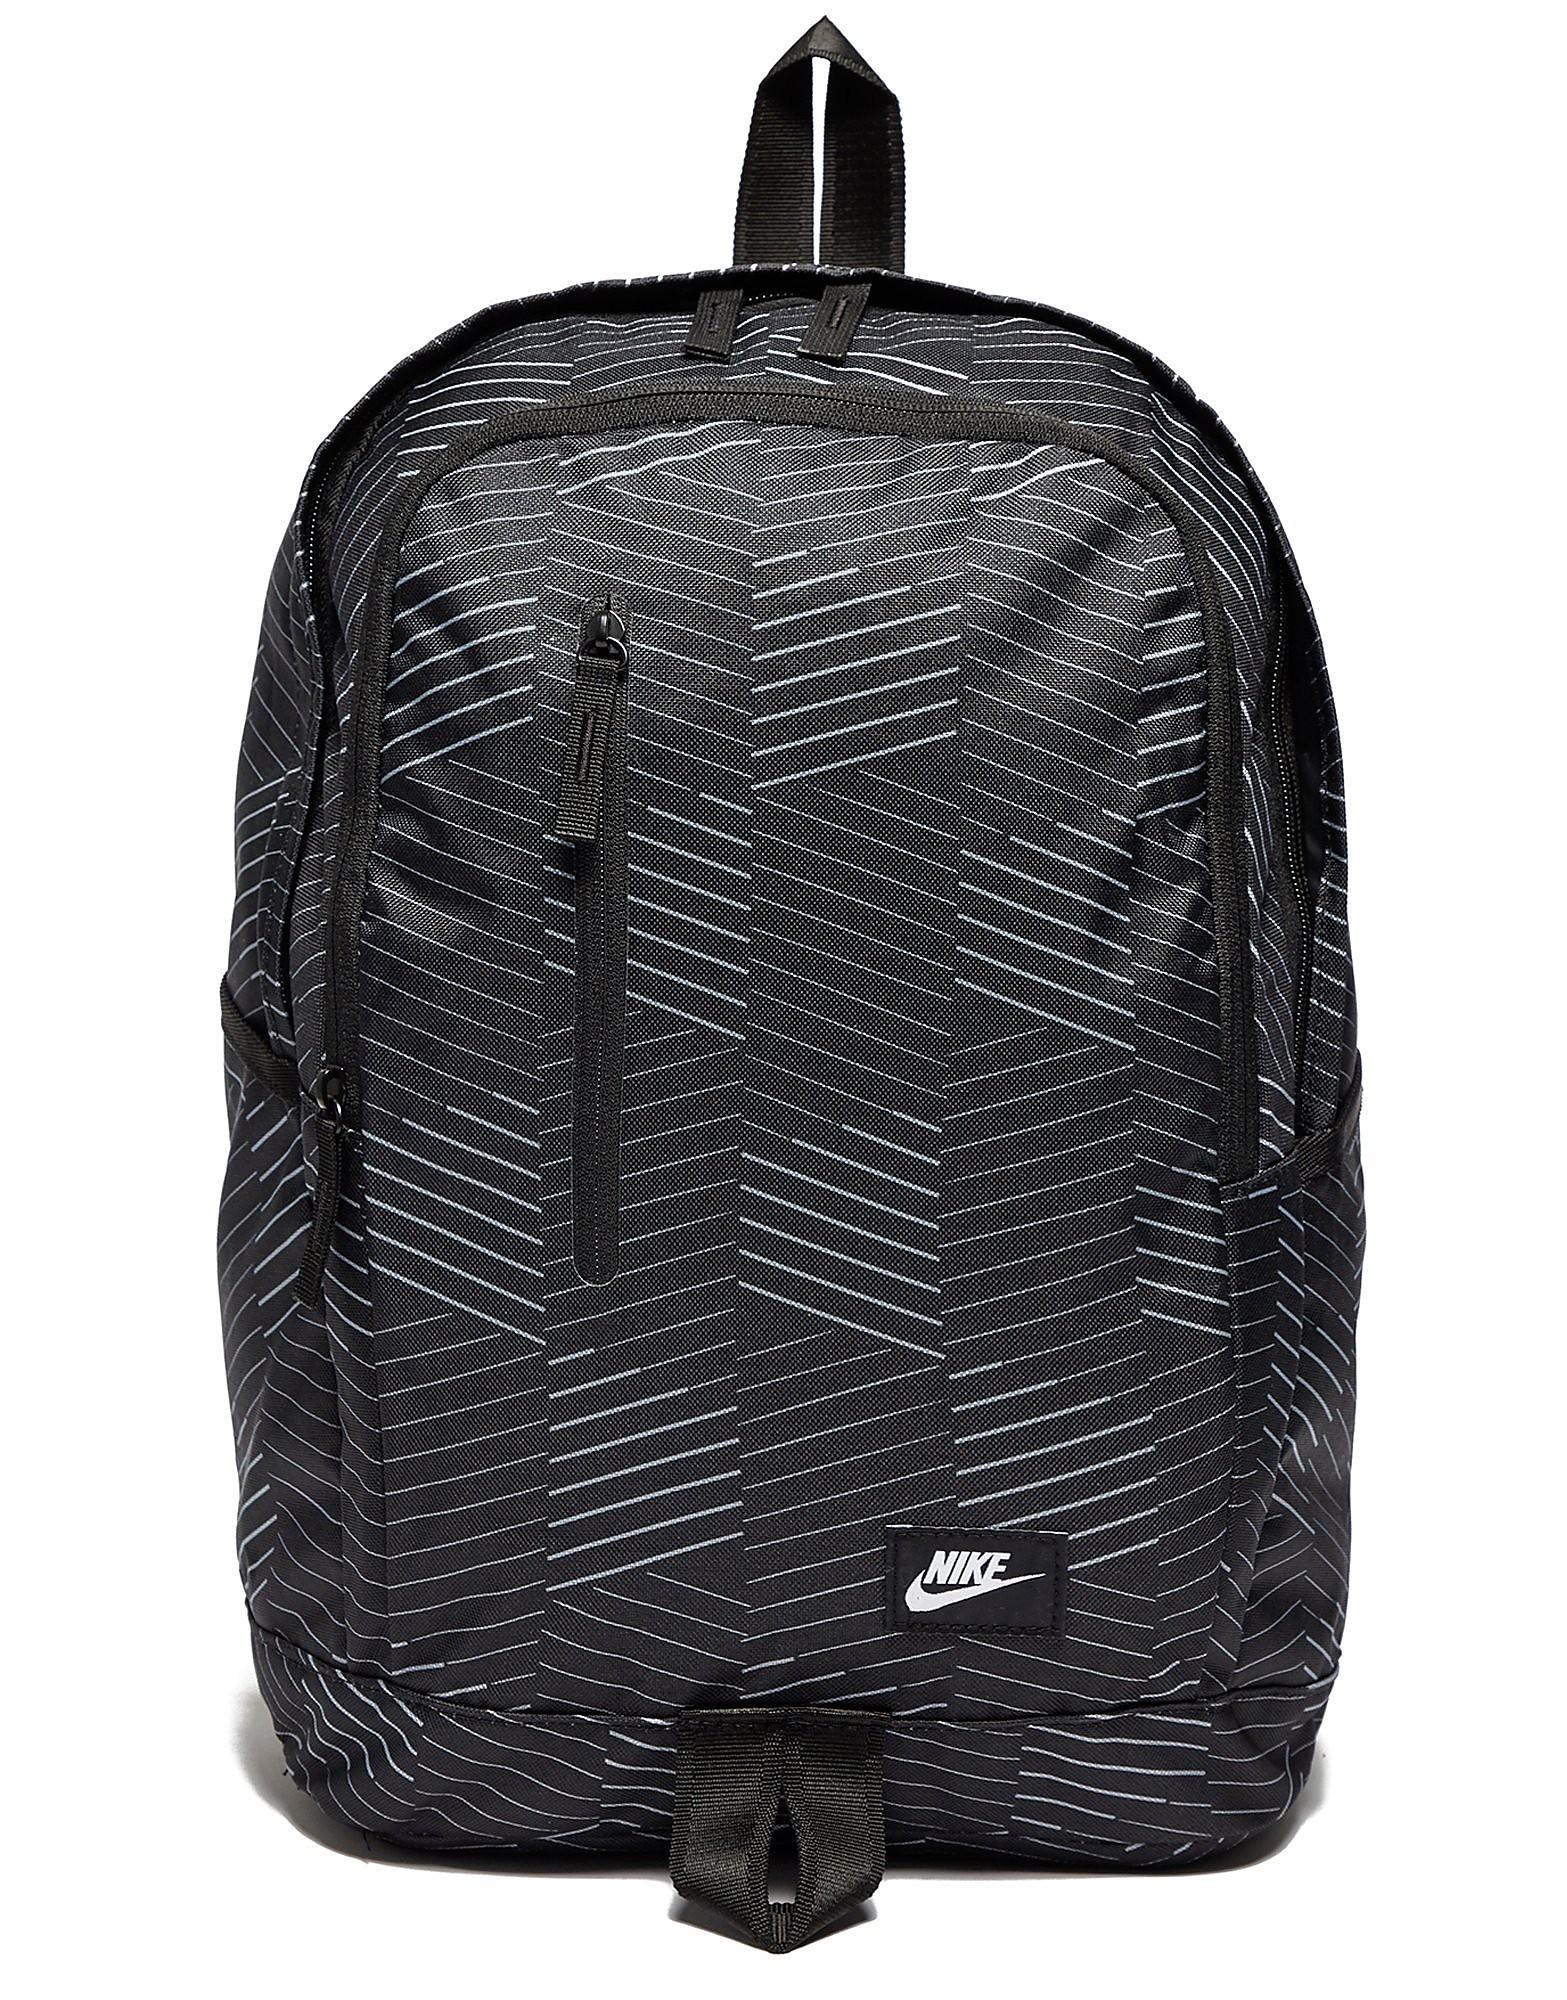 Nike Soleday Druck Rucksack